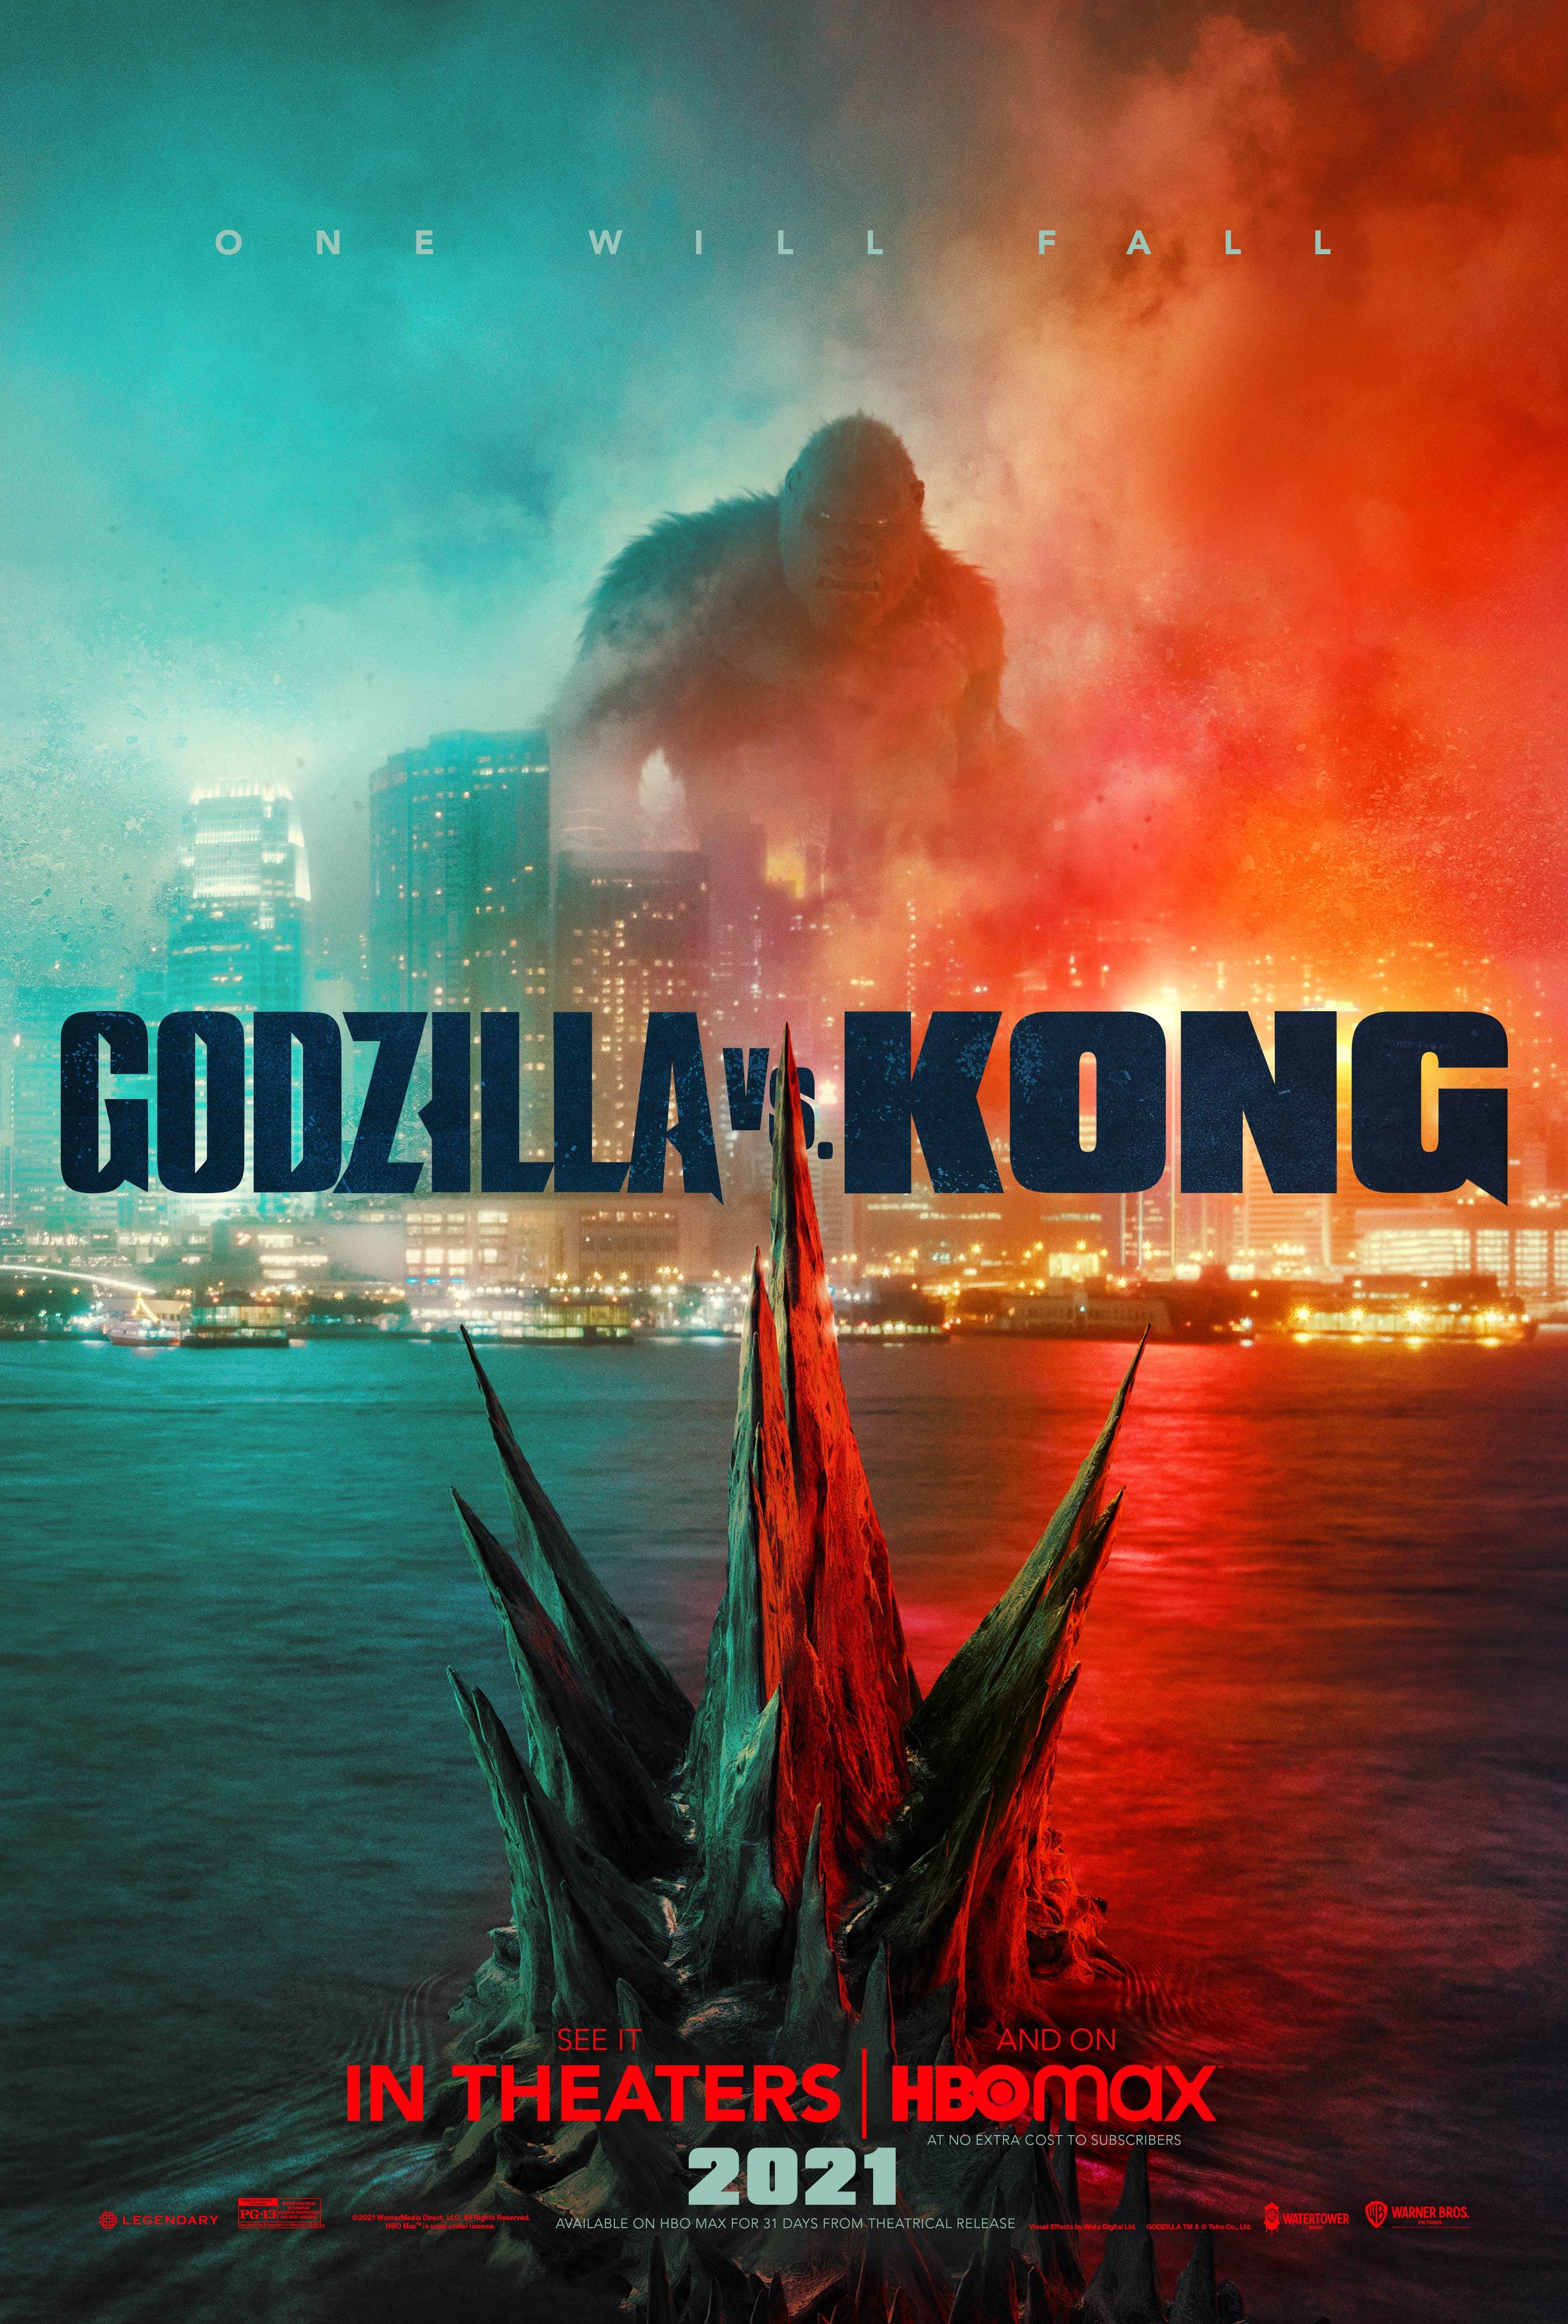 фото twitter.com/GodzillaVsKong